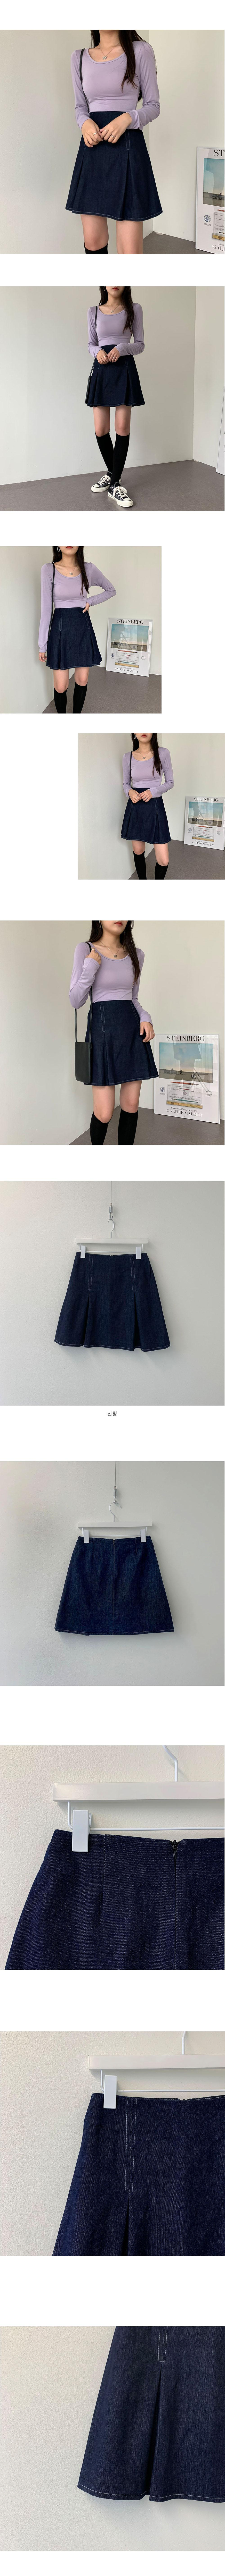 Teen pleated denim mini skirt